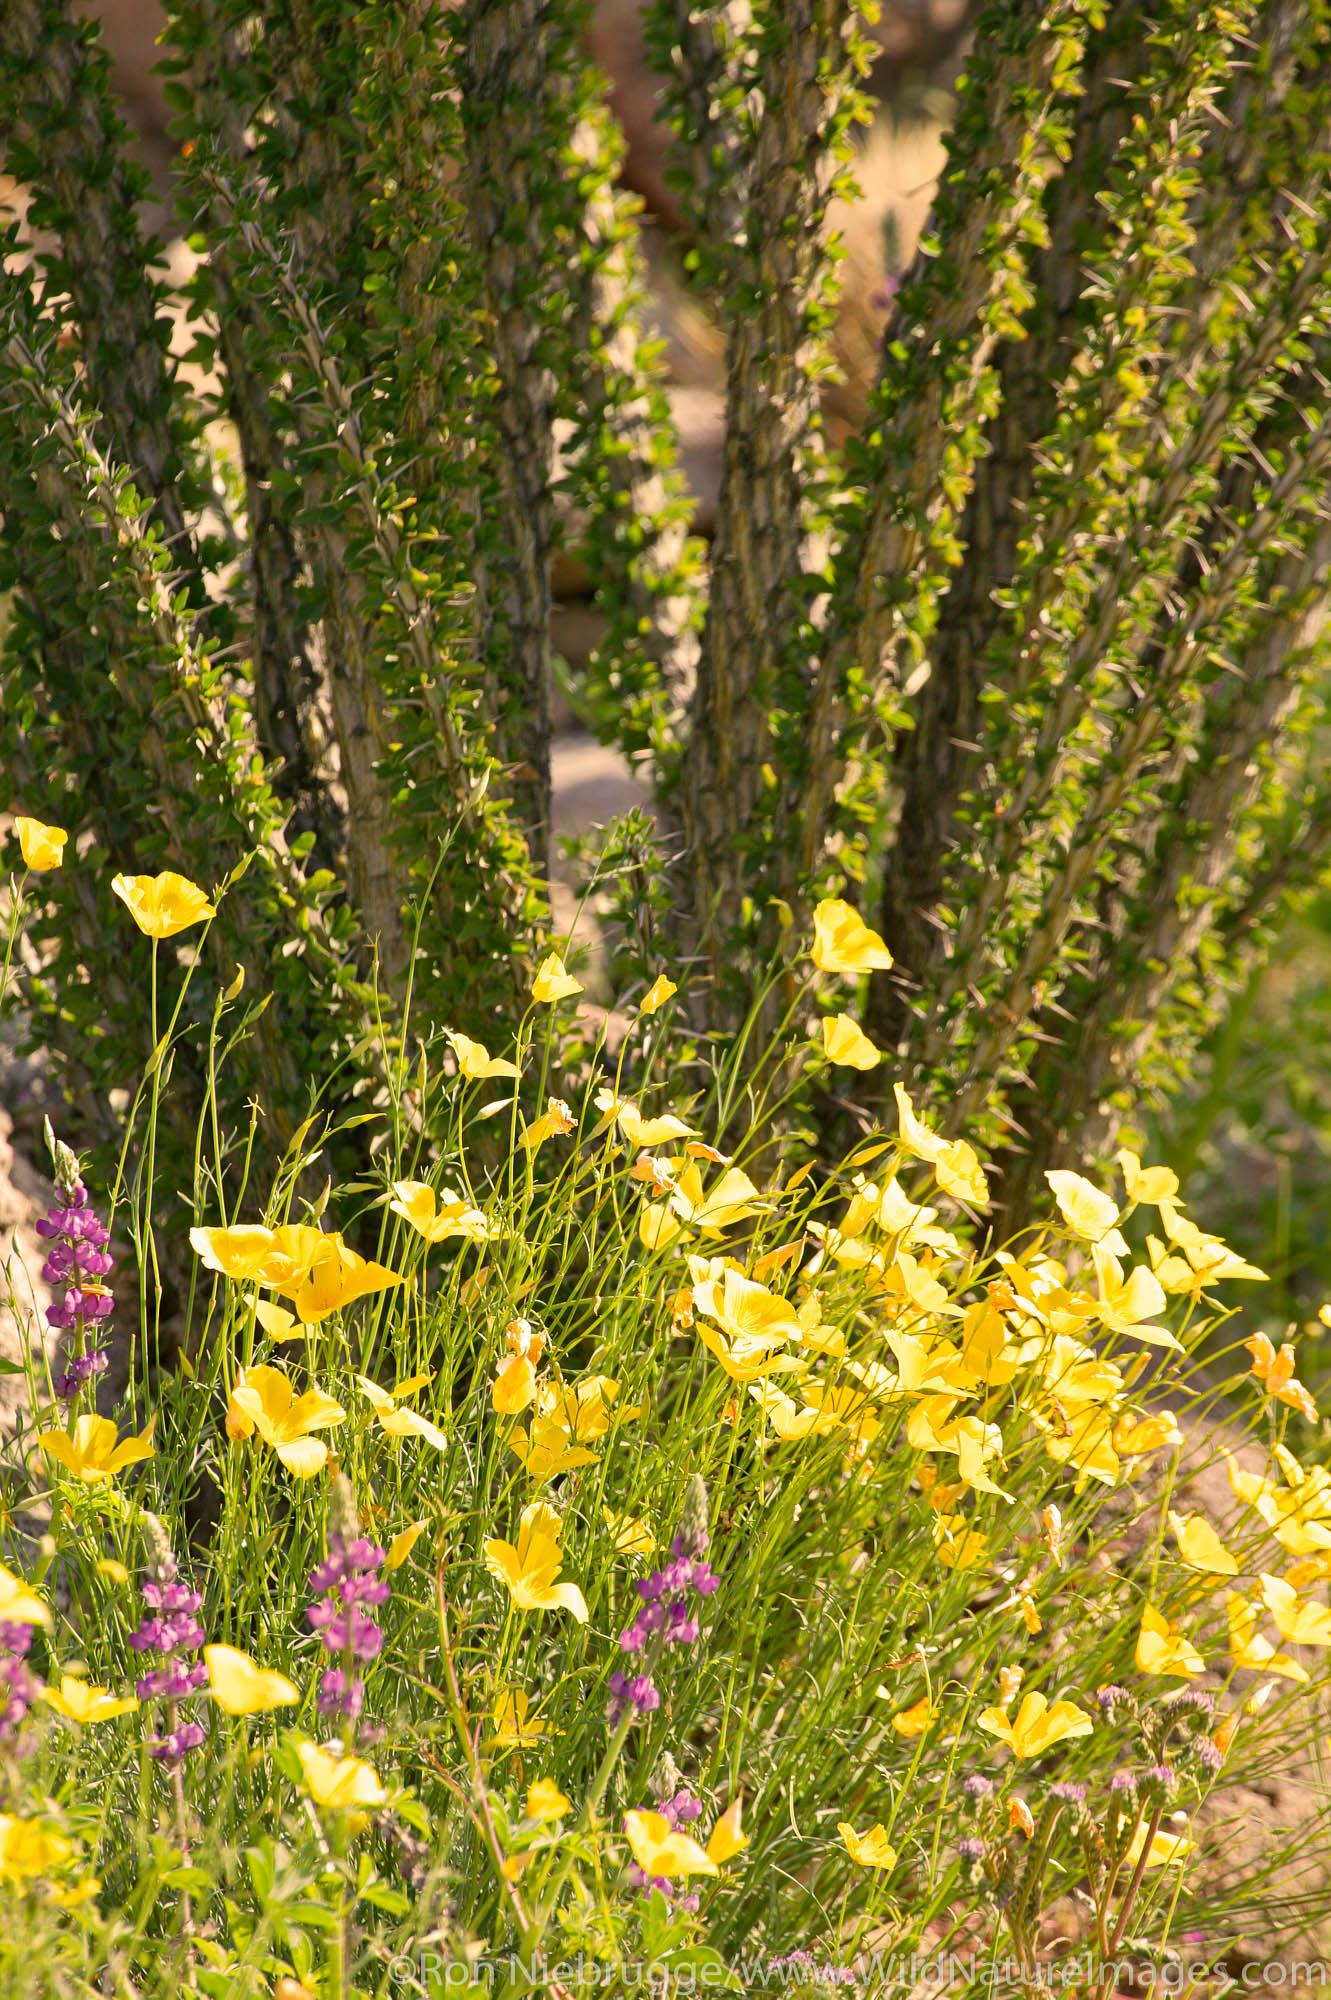 Wildflowers including Lupine Desert Gold Poppy or Goldenpoppy (Eschscholzia glyptosperma) Brittlebush (Encelia farinosa) Ocotillo...